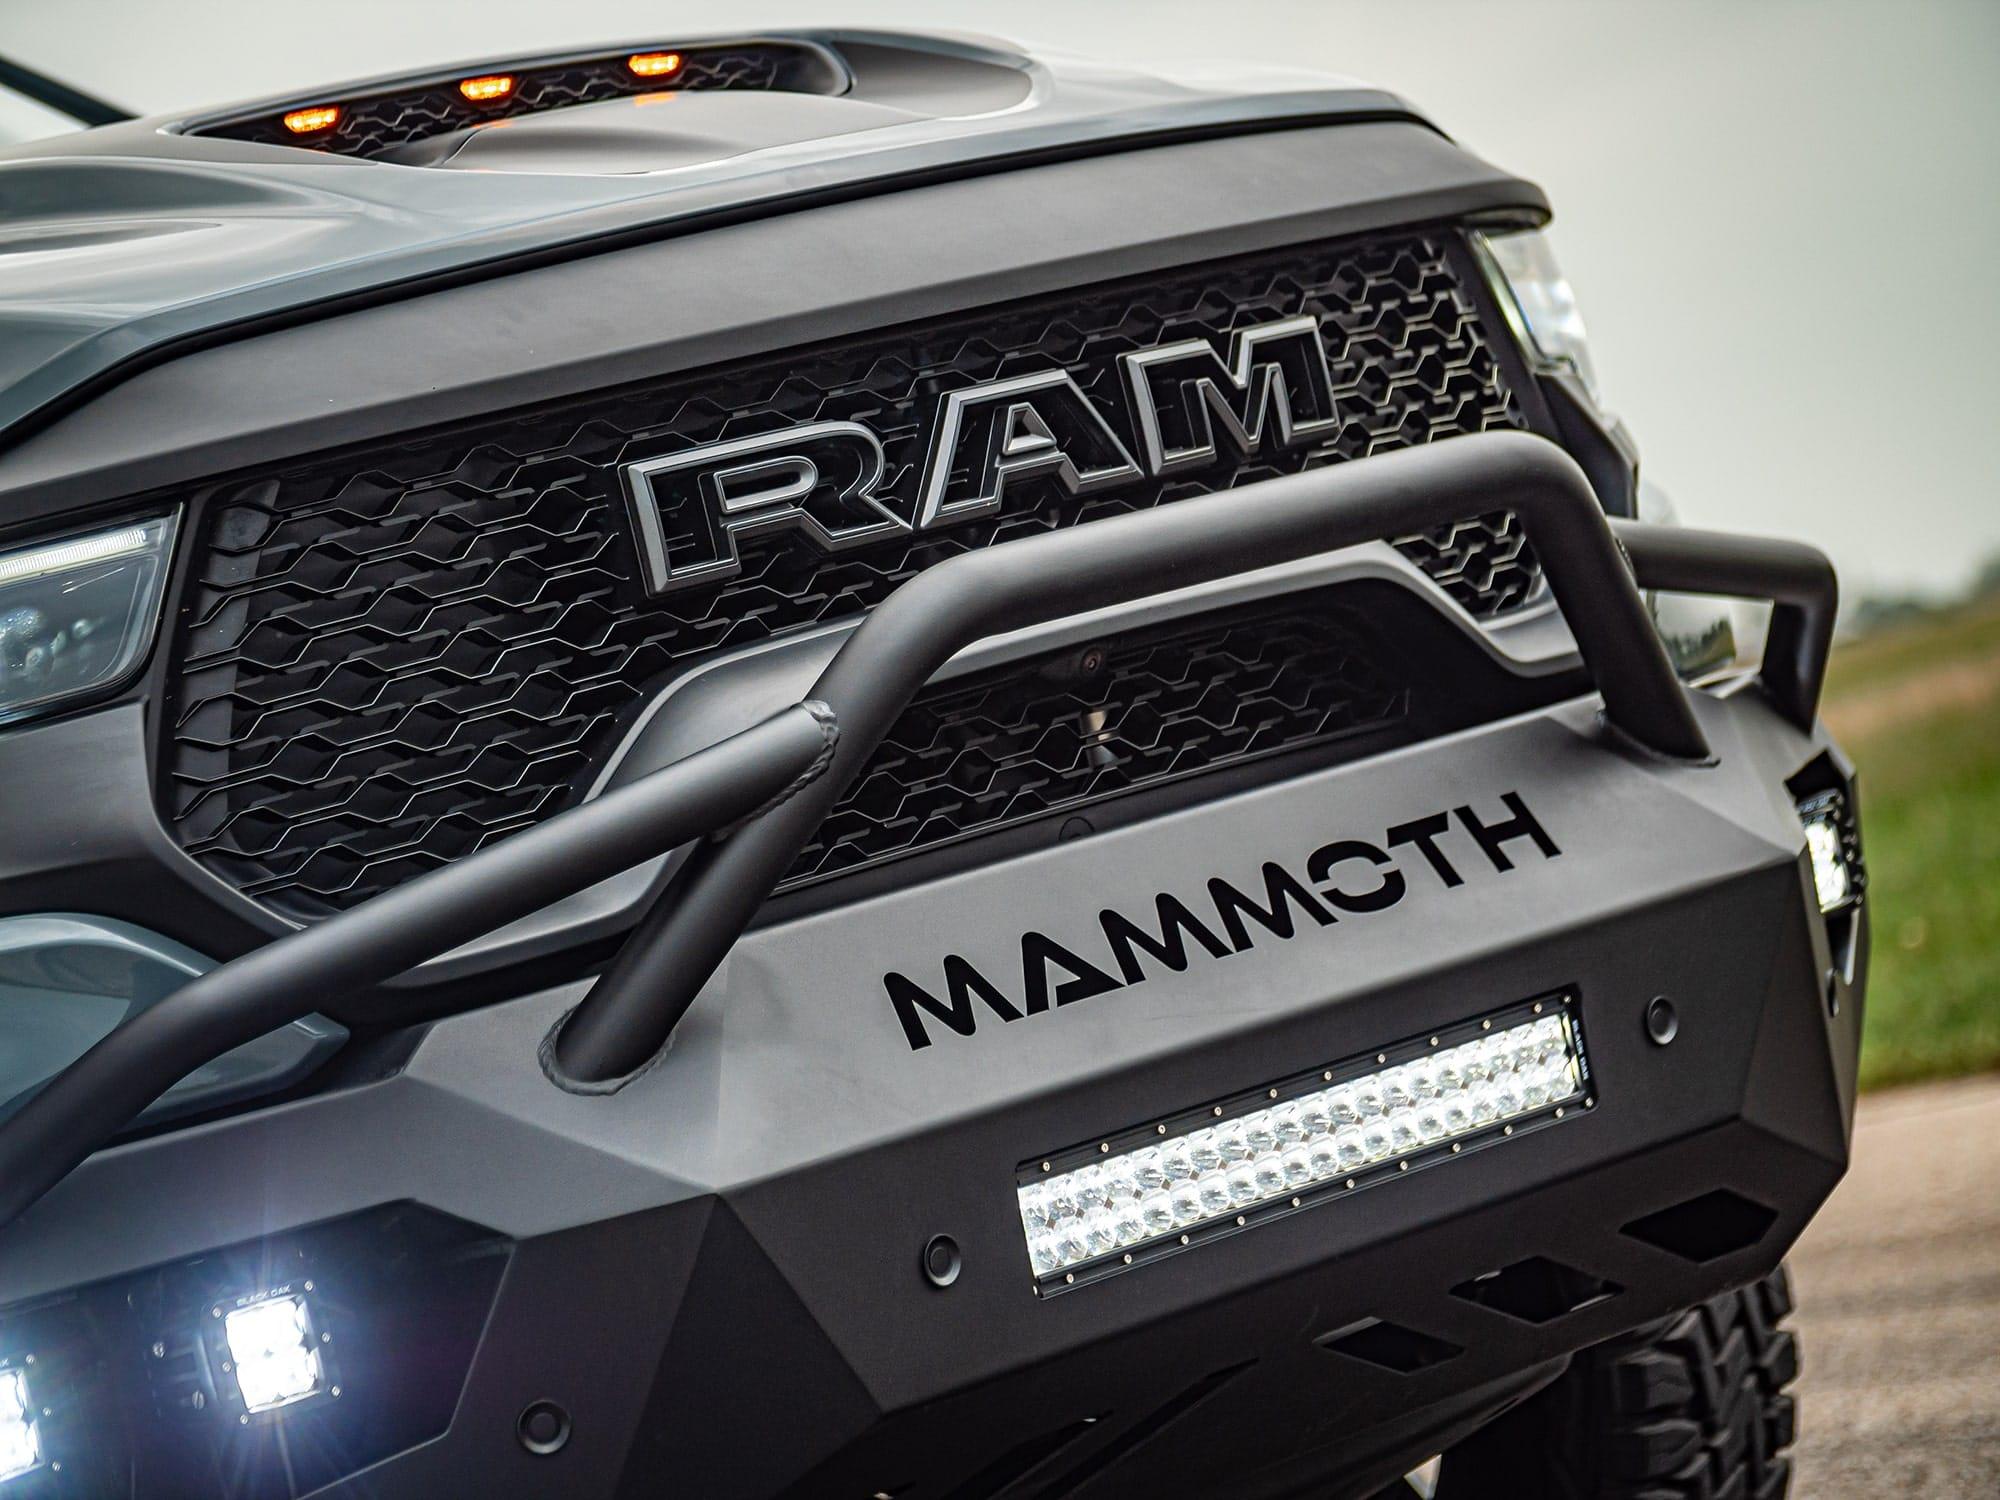 Les pare-chocs sur mesure du MAMMOTH OFF-ROAD STAGE 1. Source: http://hennesseyperformance.com/vehicles/dodge/ram-1500-trx/